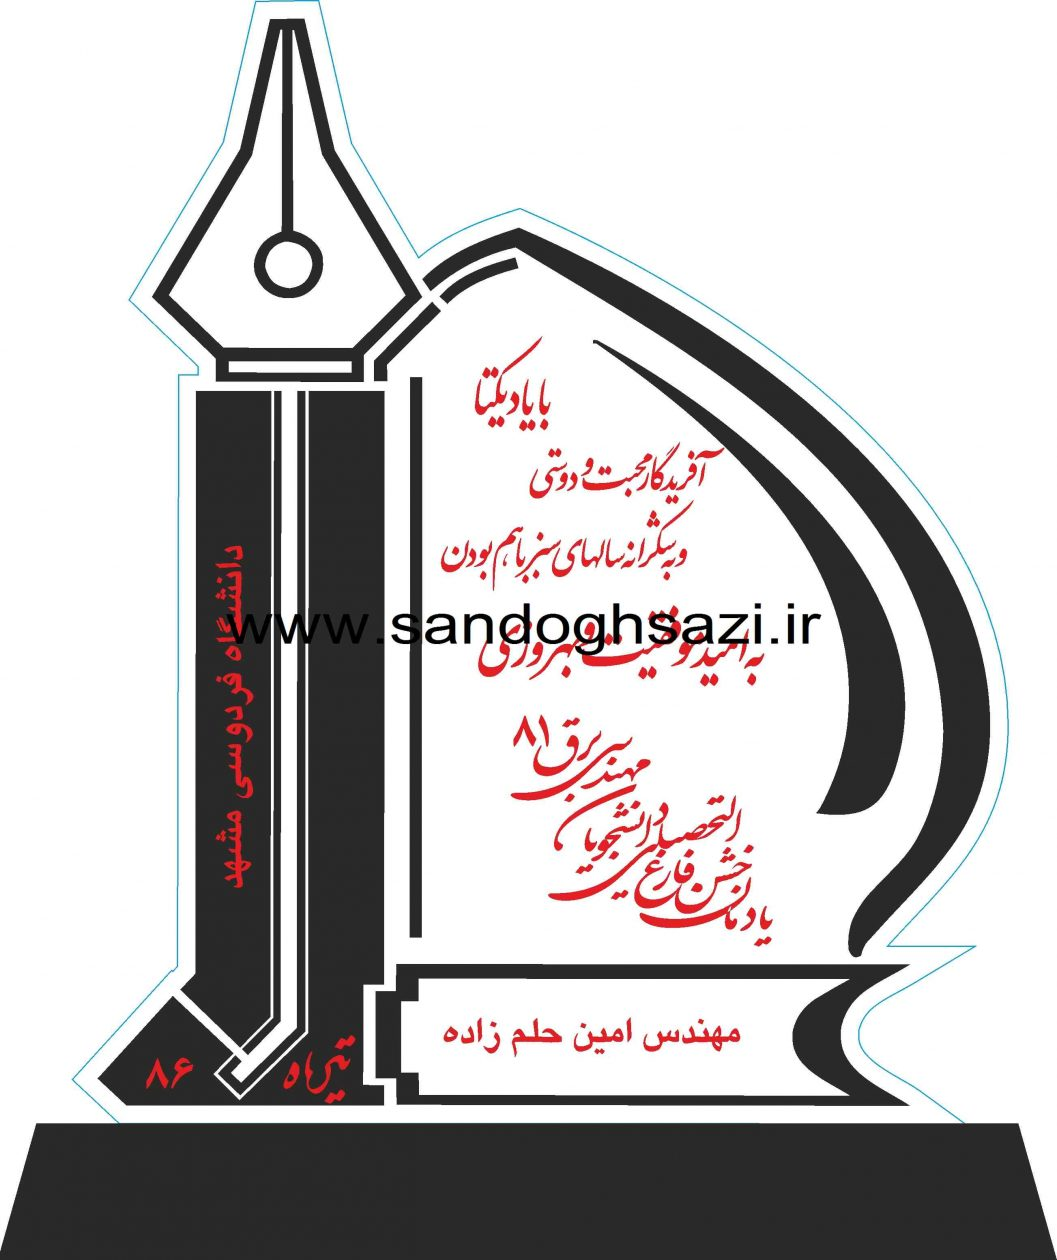 tandis daneshgah azad4